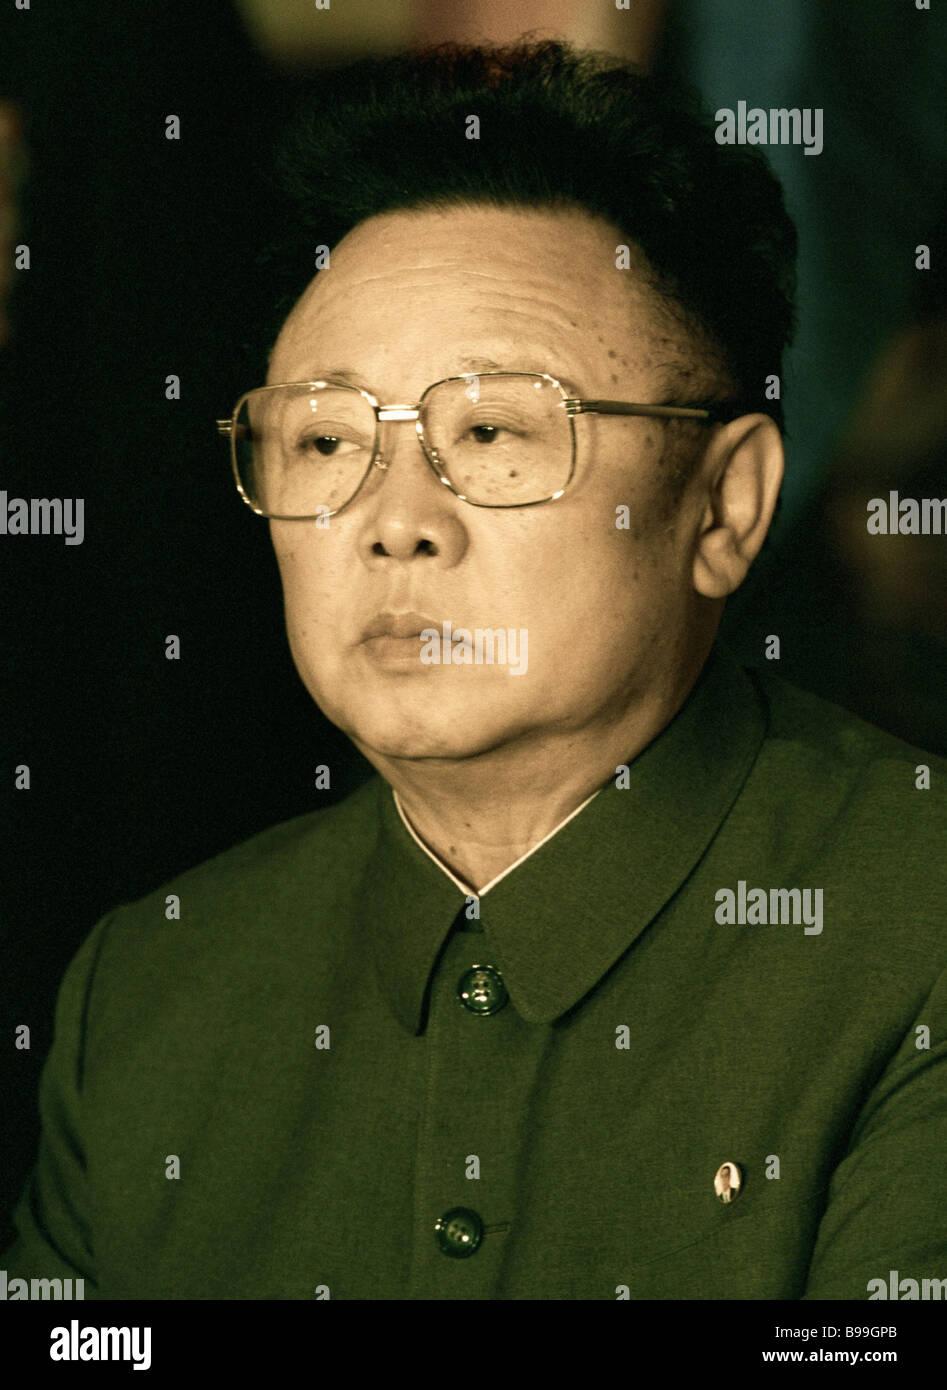 Kim Jong Il leader of the Democratic People s Republic of Korea visits Russia - Stock Image